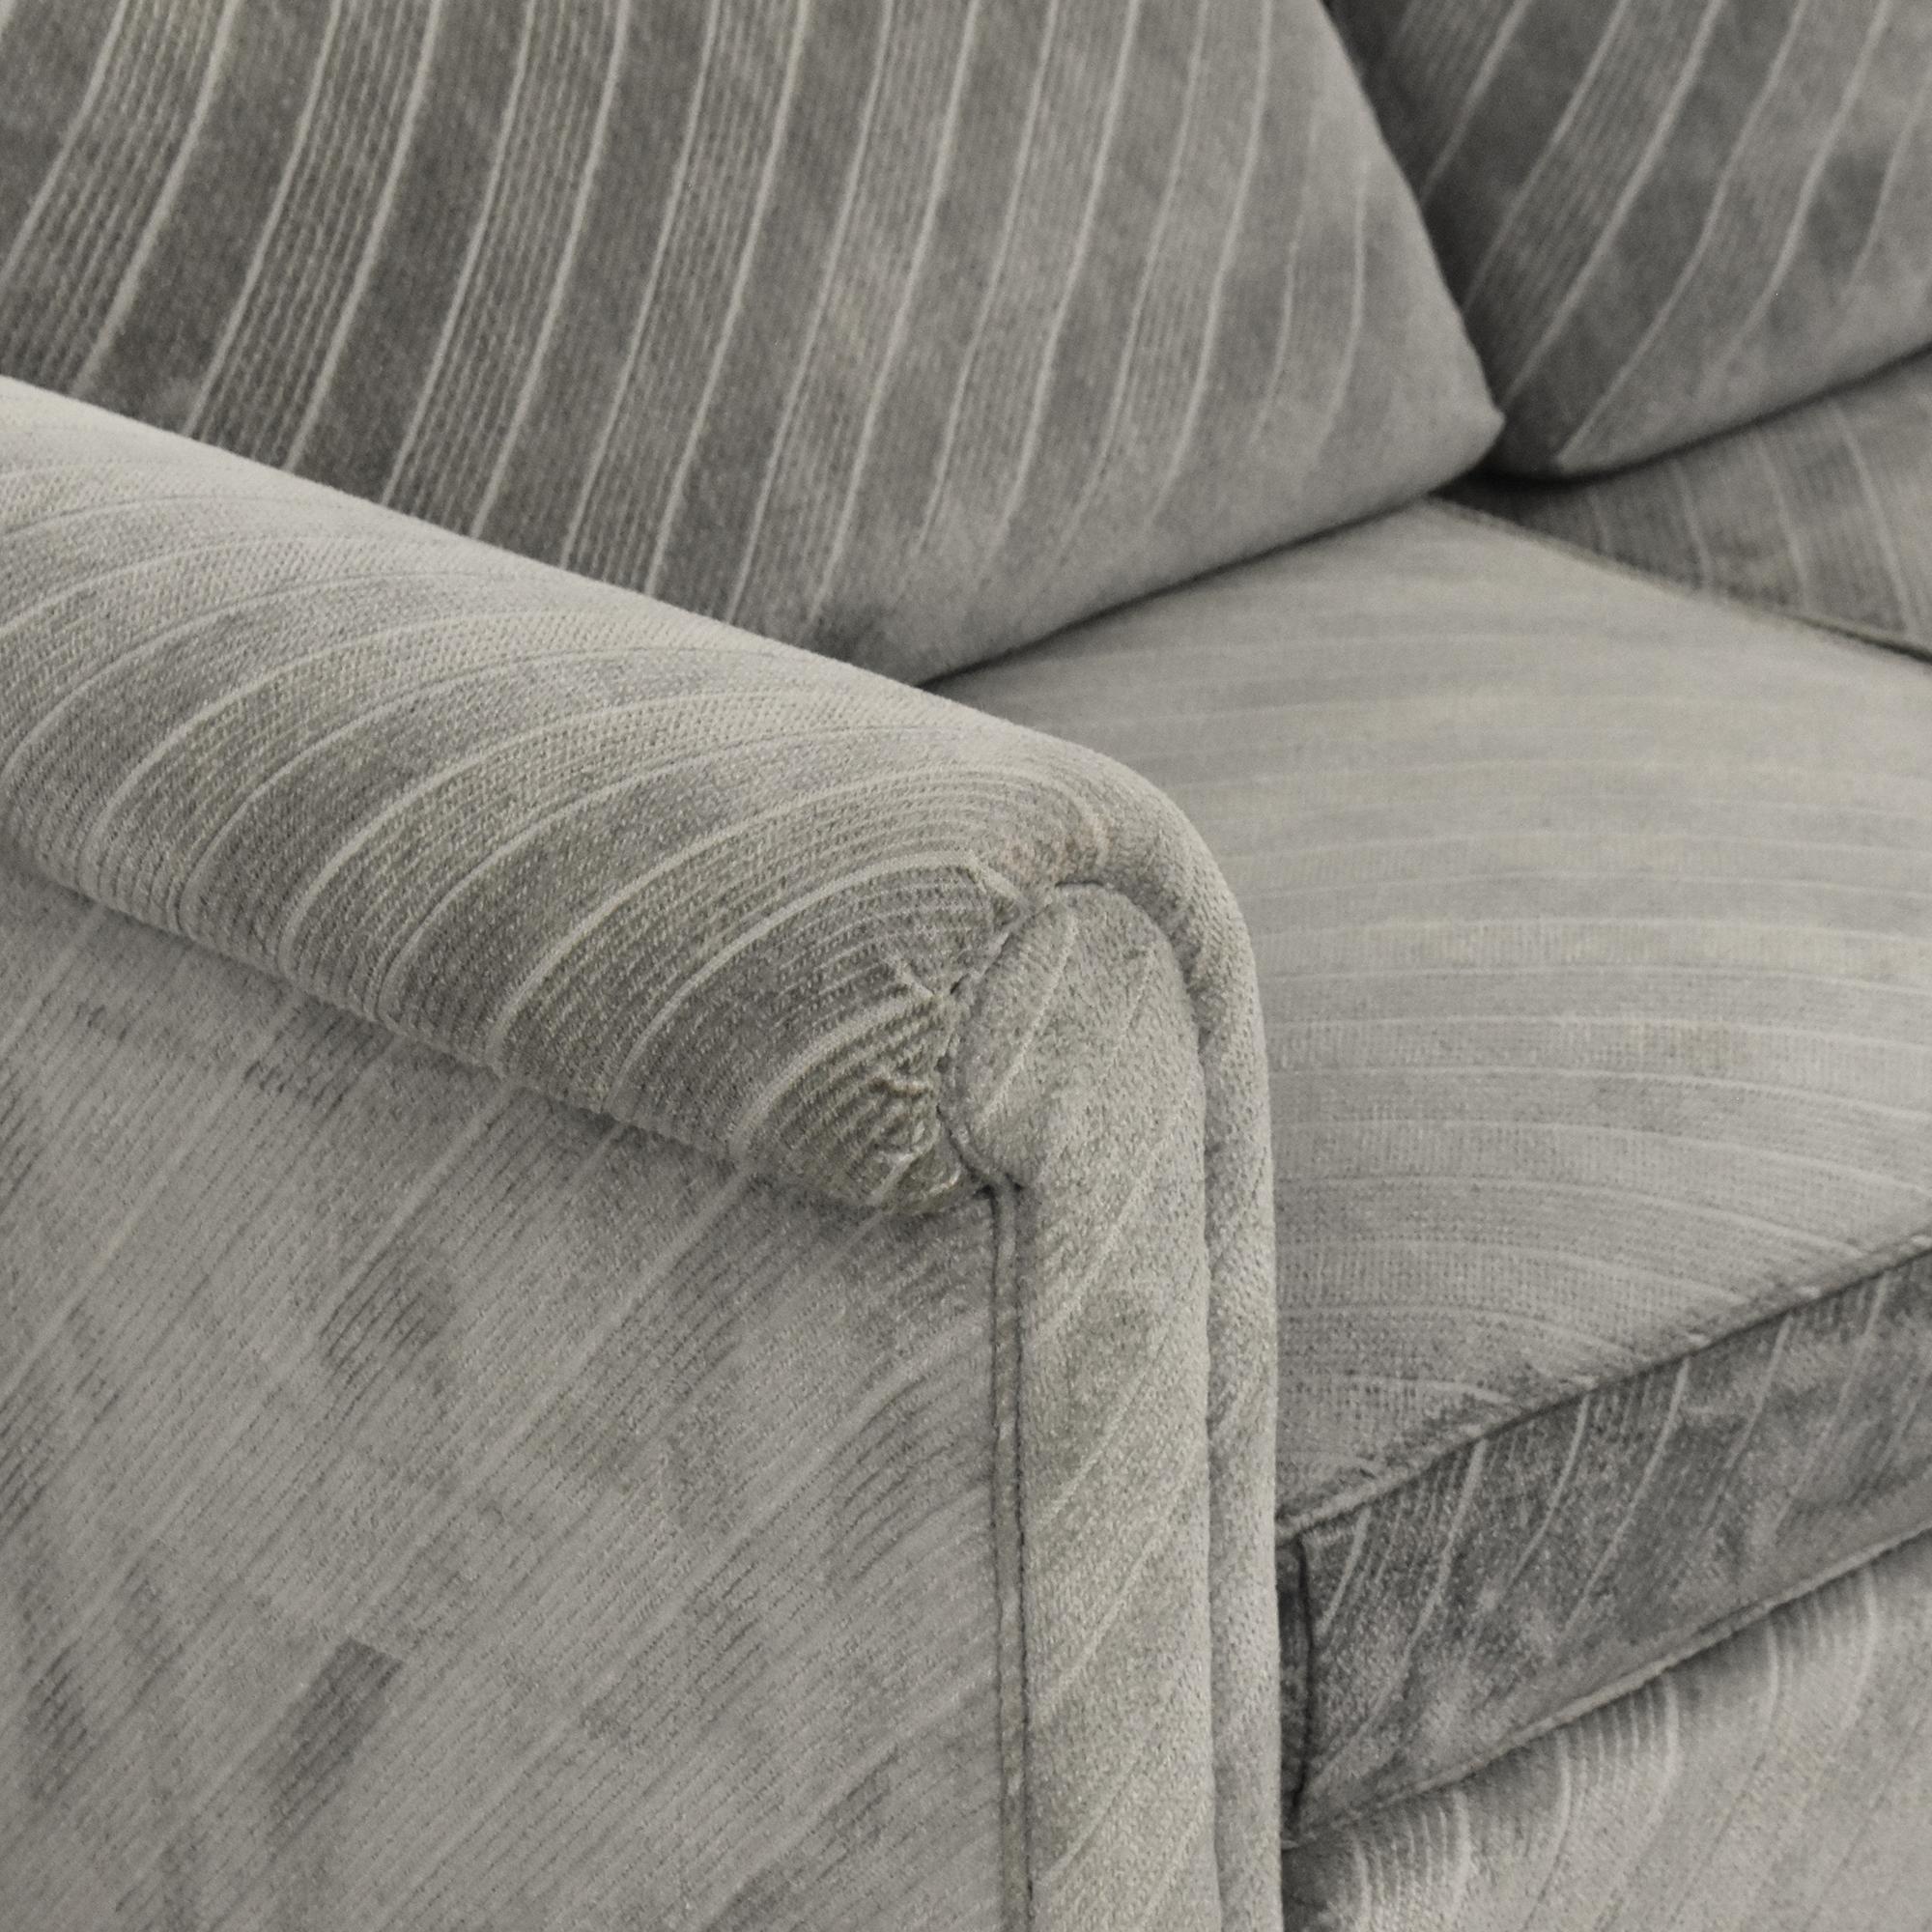 Baker Furniture Baker Furniture Historic Charleston Roll Arm Sofa dimensions